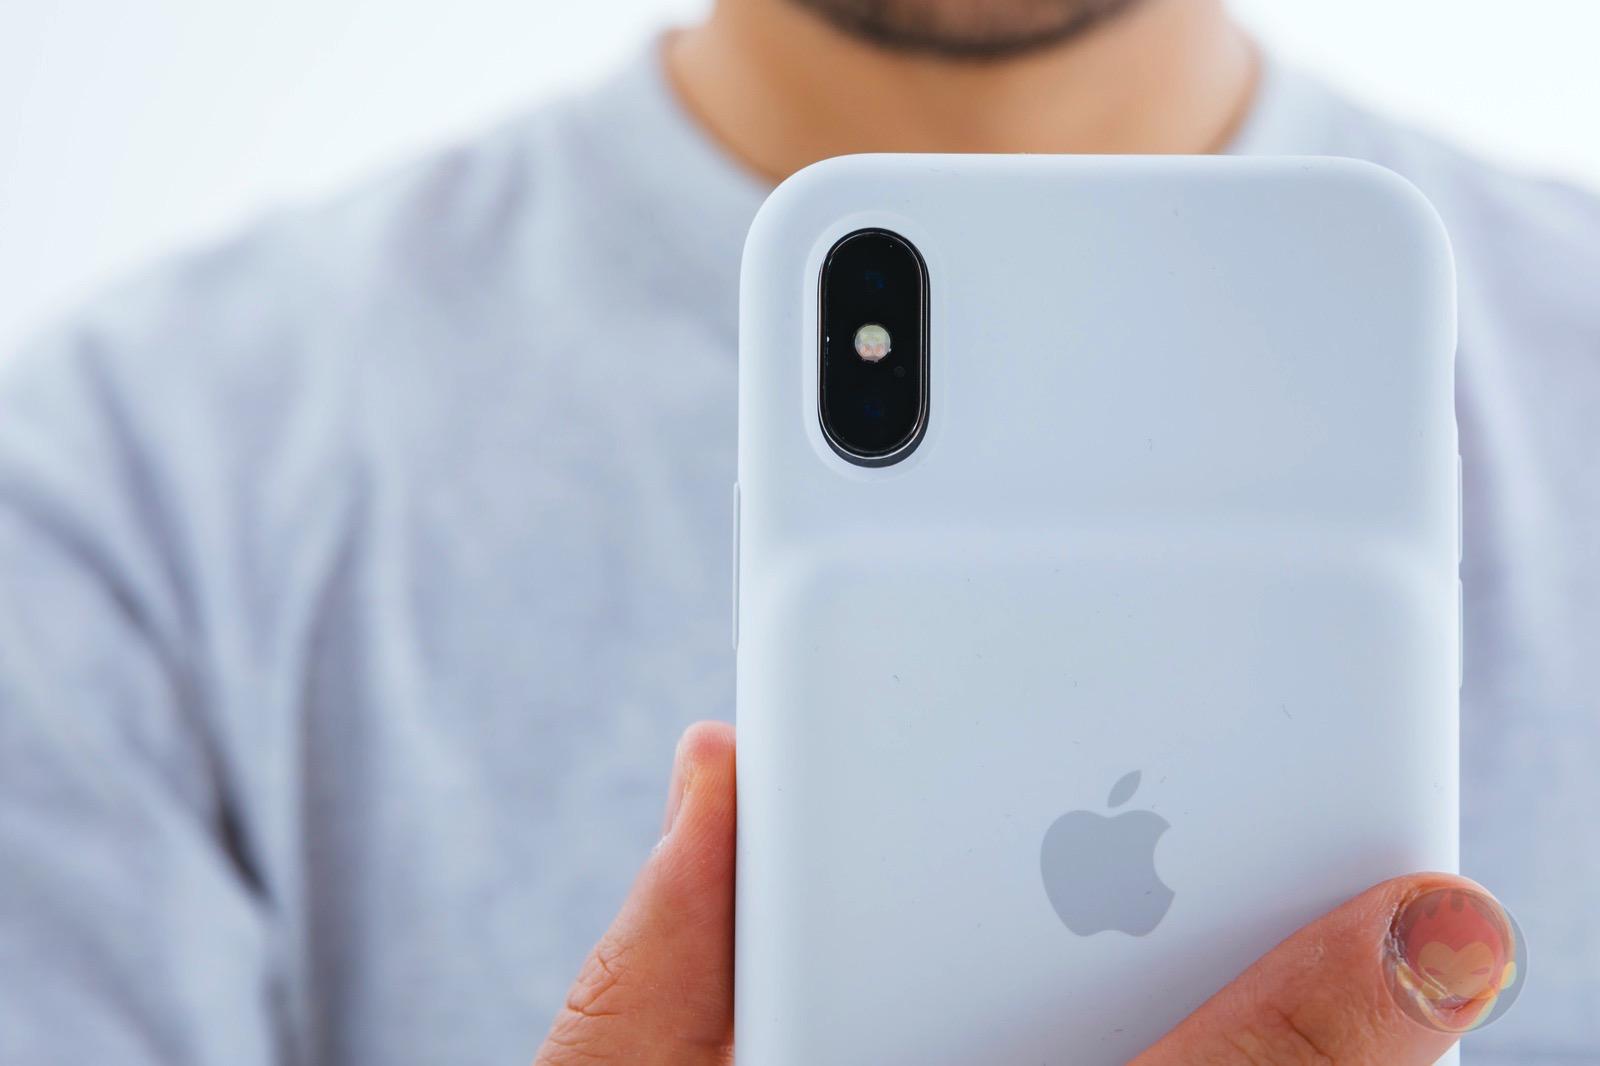 Smart-Battery-Case-for-iPhoneXS-Review-22.jpg